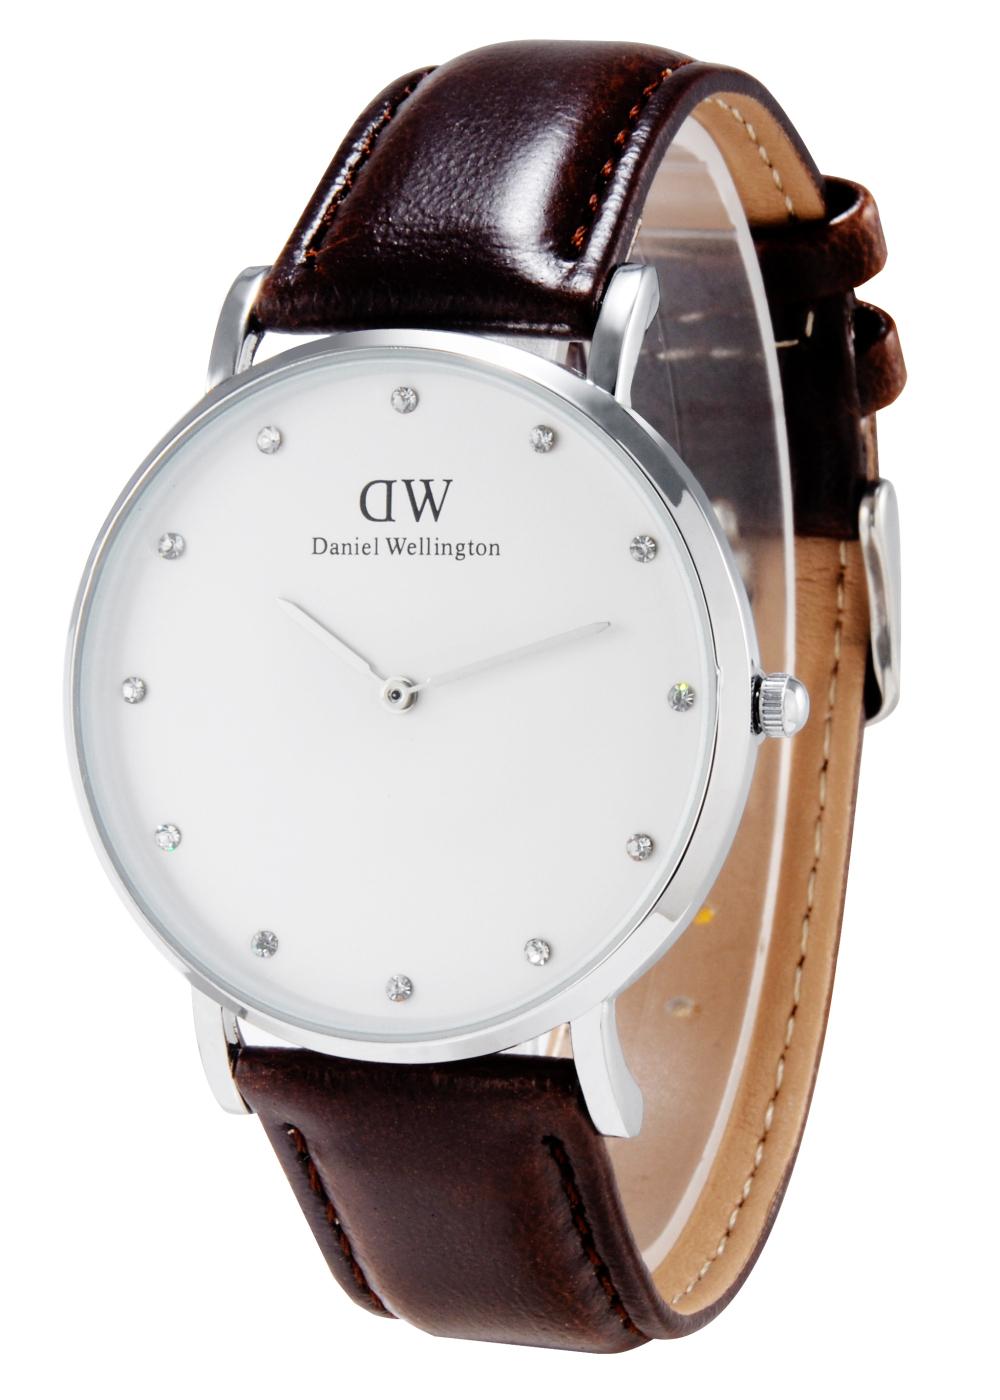 Brand Luxury Watches Men Watch 40mm For Men women Leather strap Military Quartz Clock Reloj with